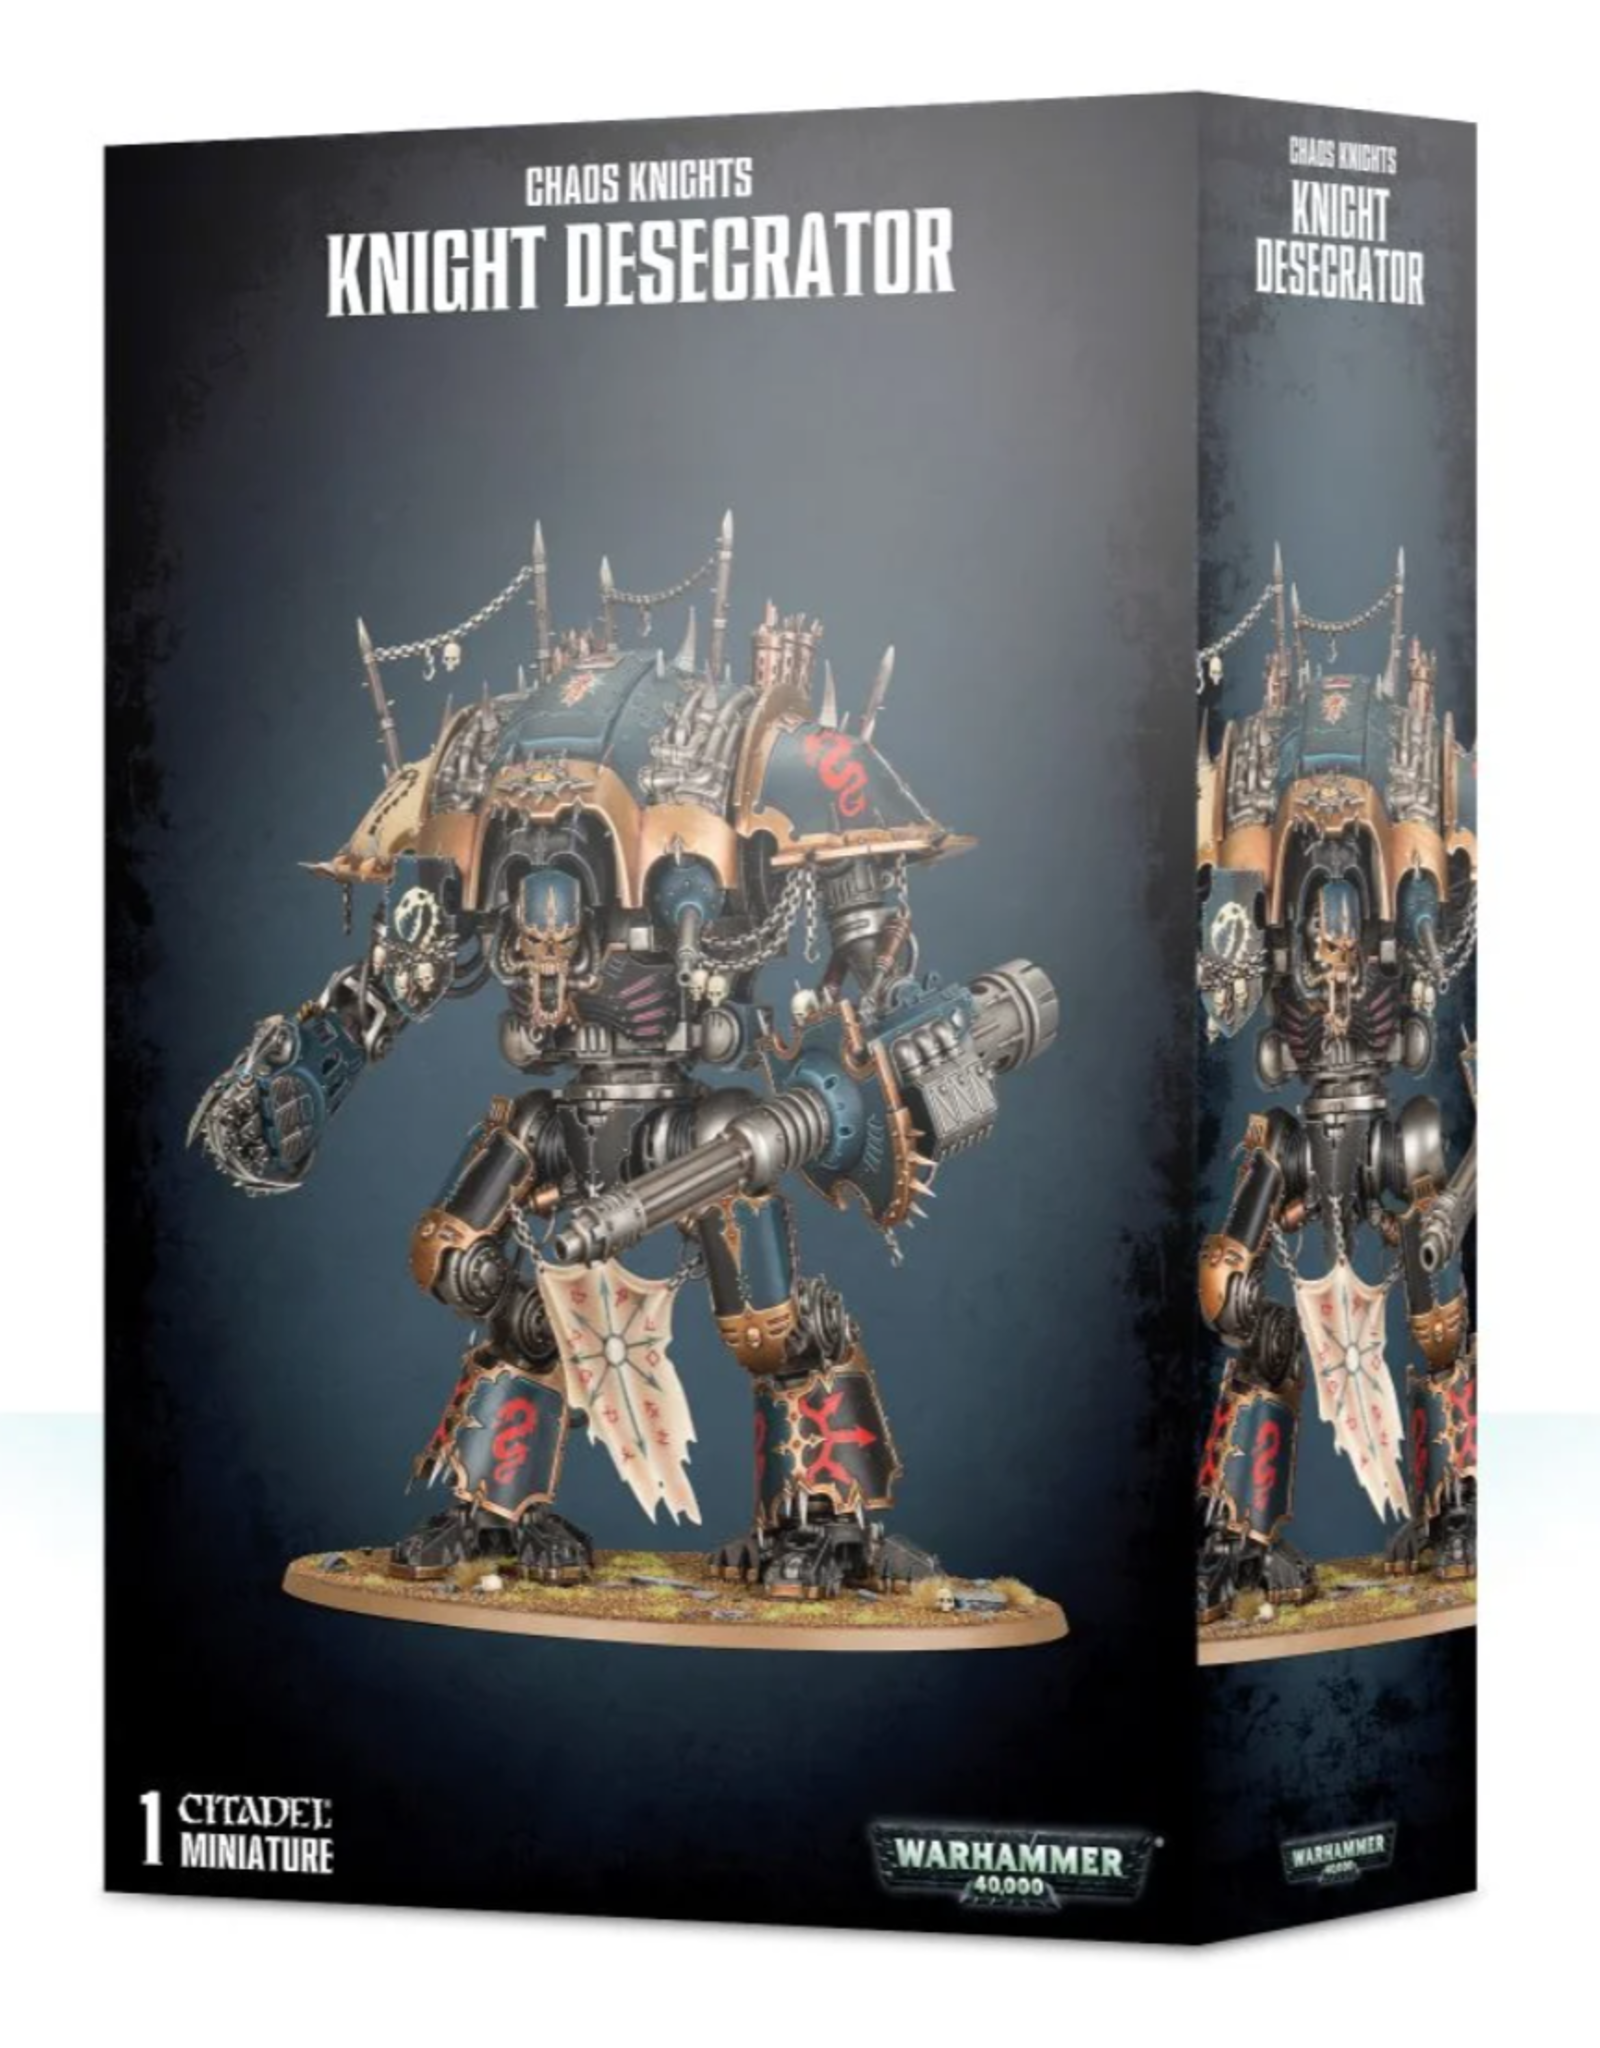 Warhammer 40K Chaos Knights: Knight Desecrator